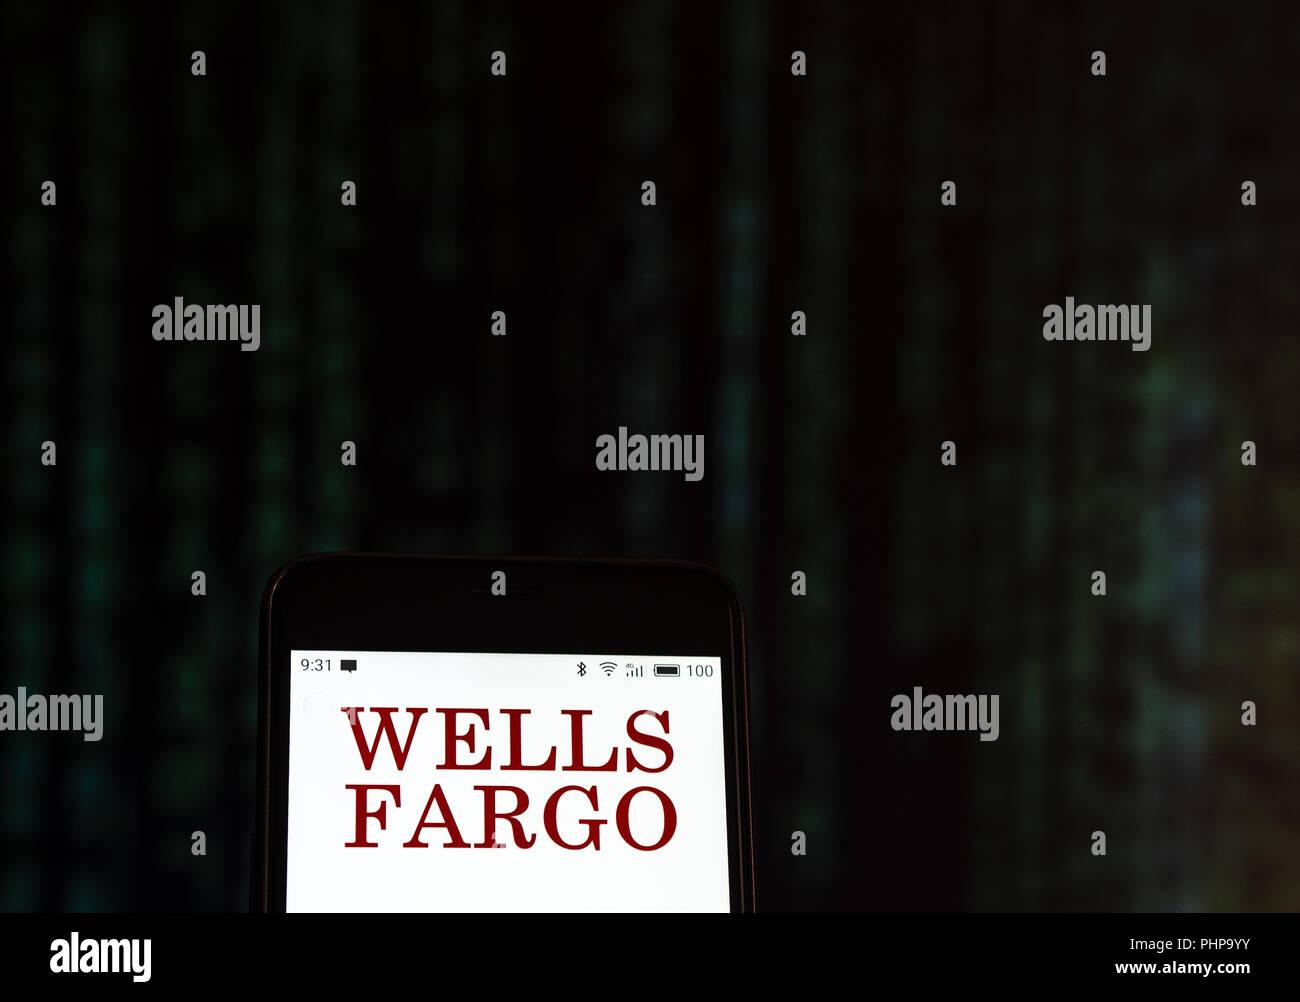 Wells Fargo Wiring Instructions Alabama Trusted Diagram Logo Stock Photos Images Alamy Rj45 Telephone